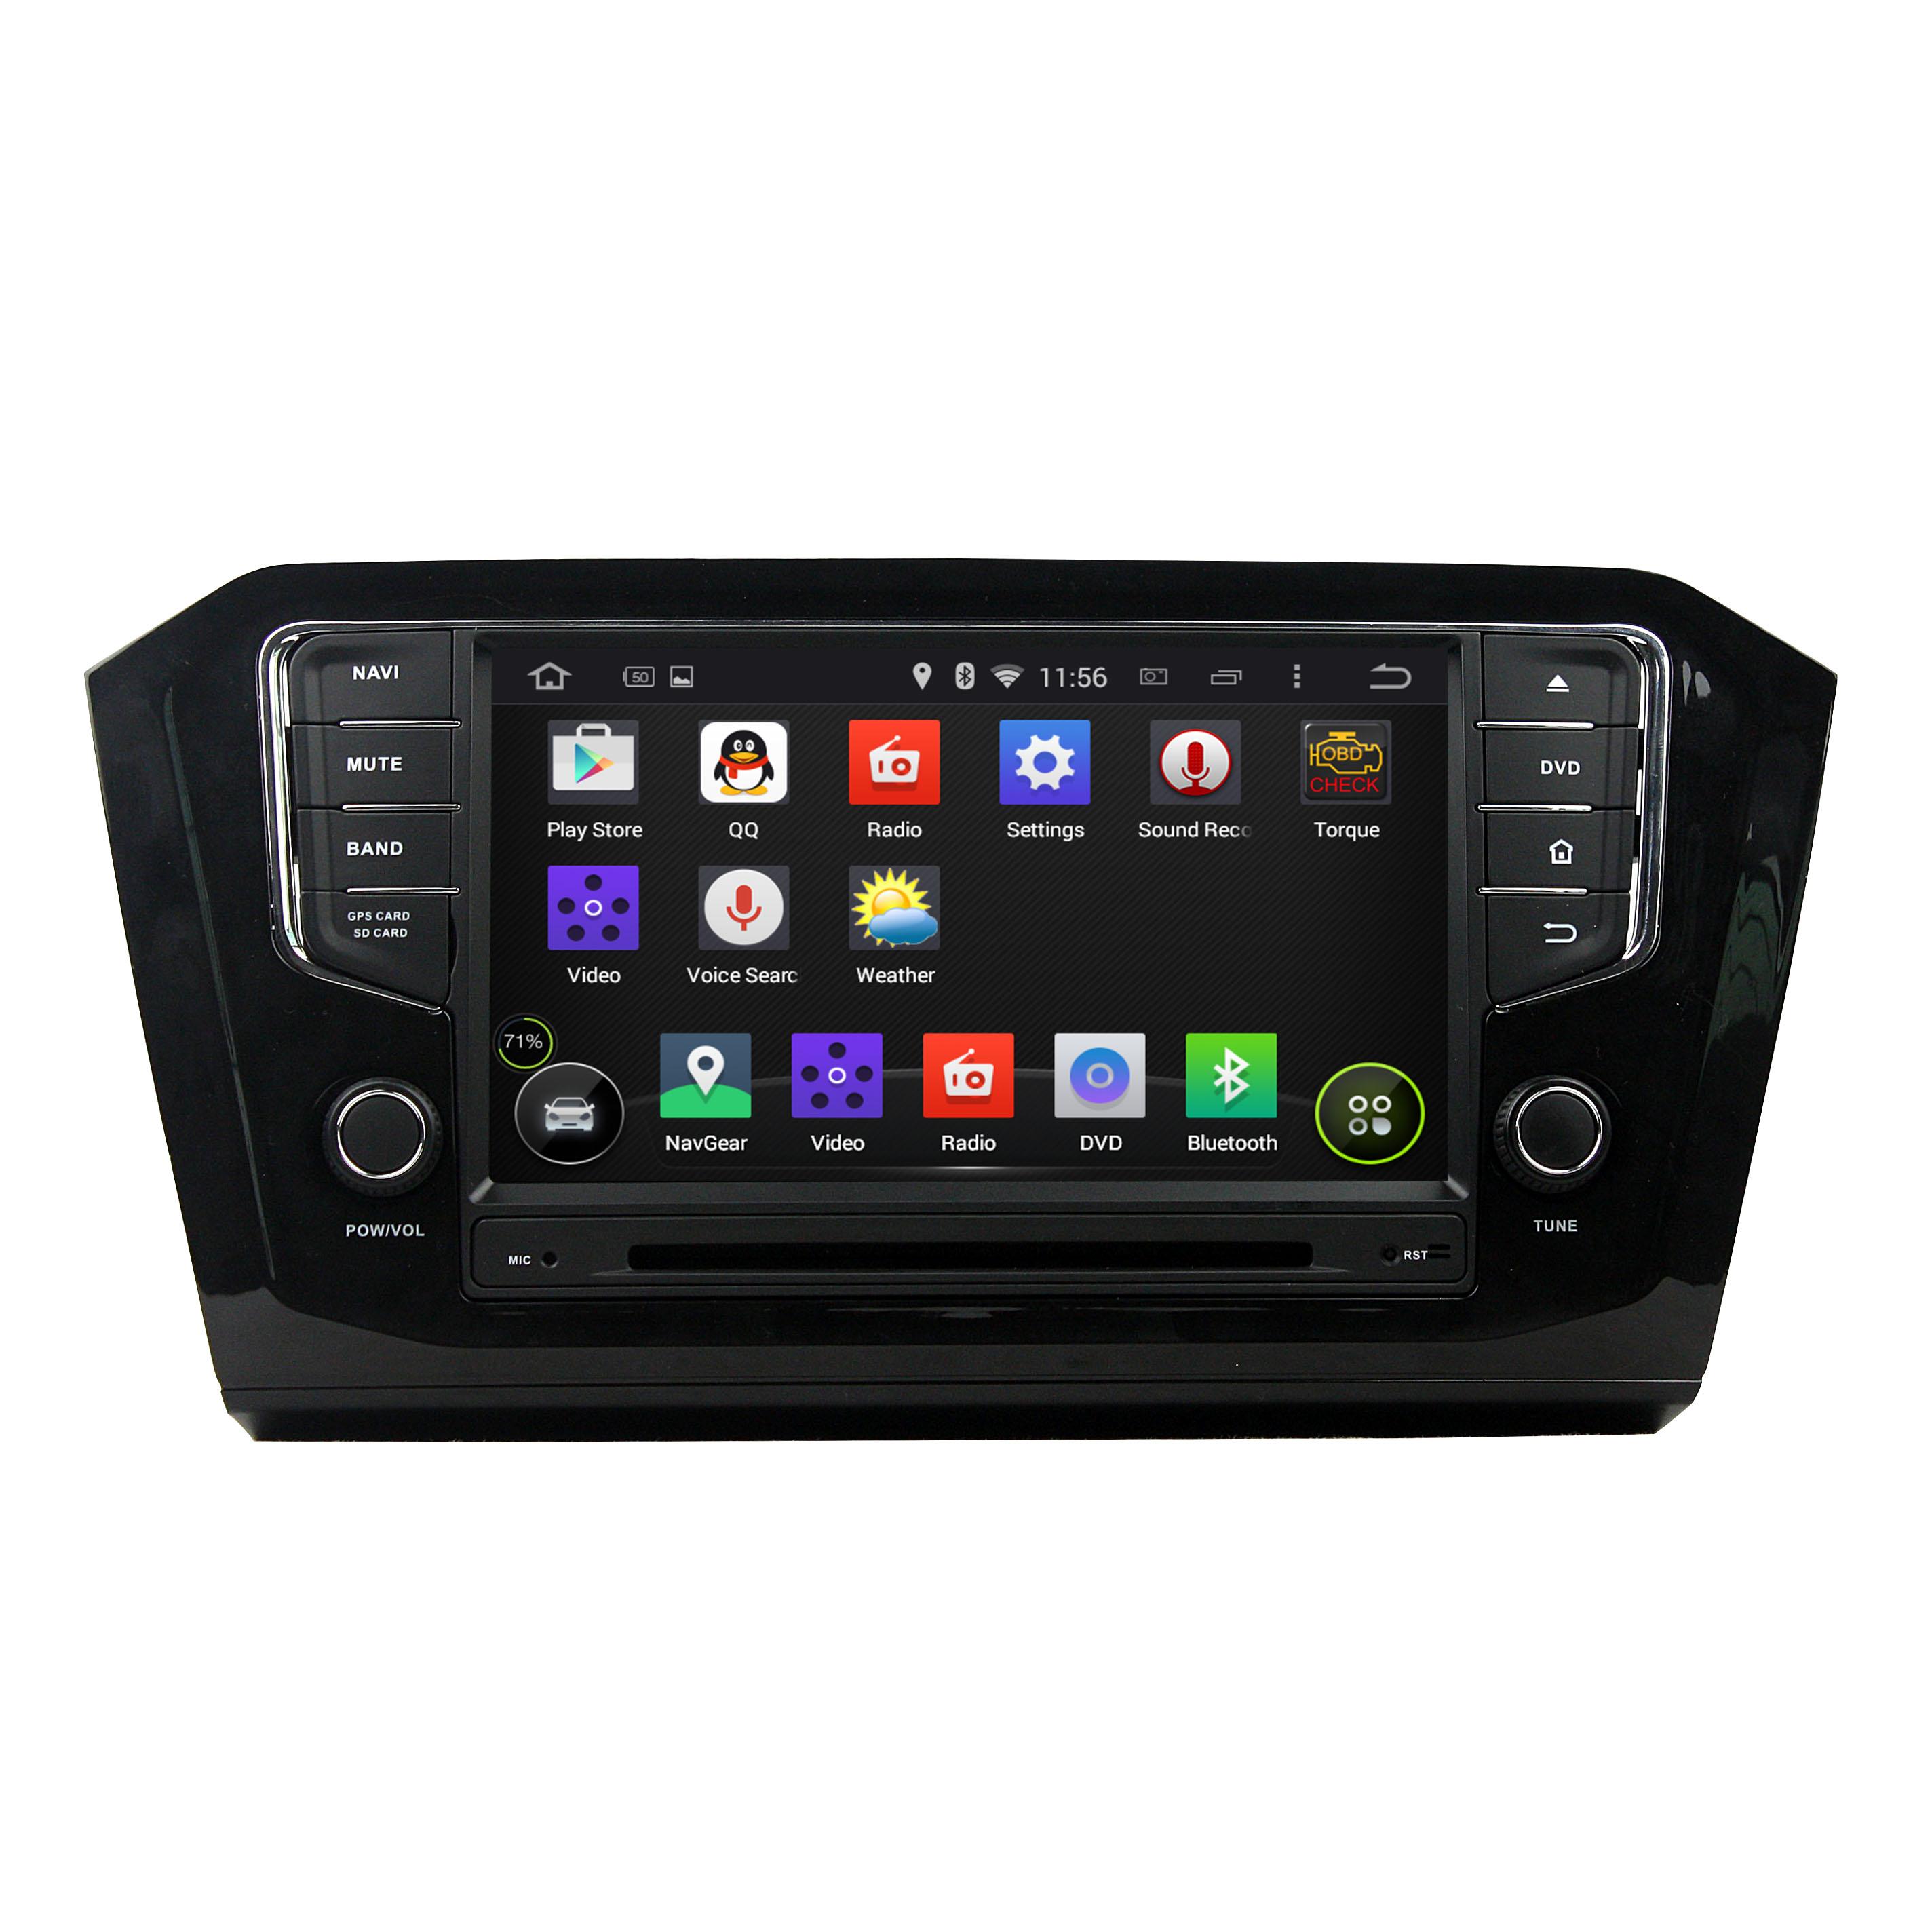 PASSAT 2015 Car DVD Player for VW series